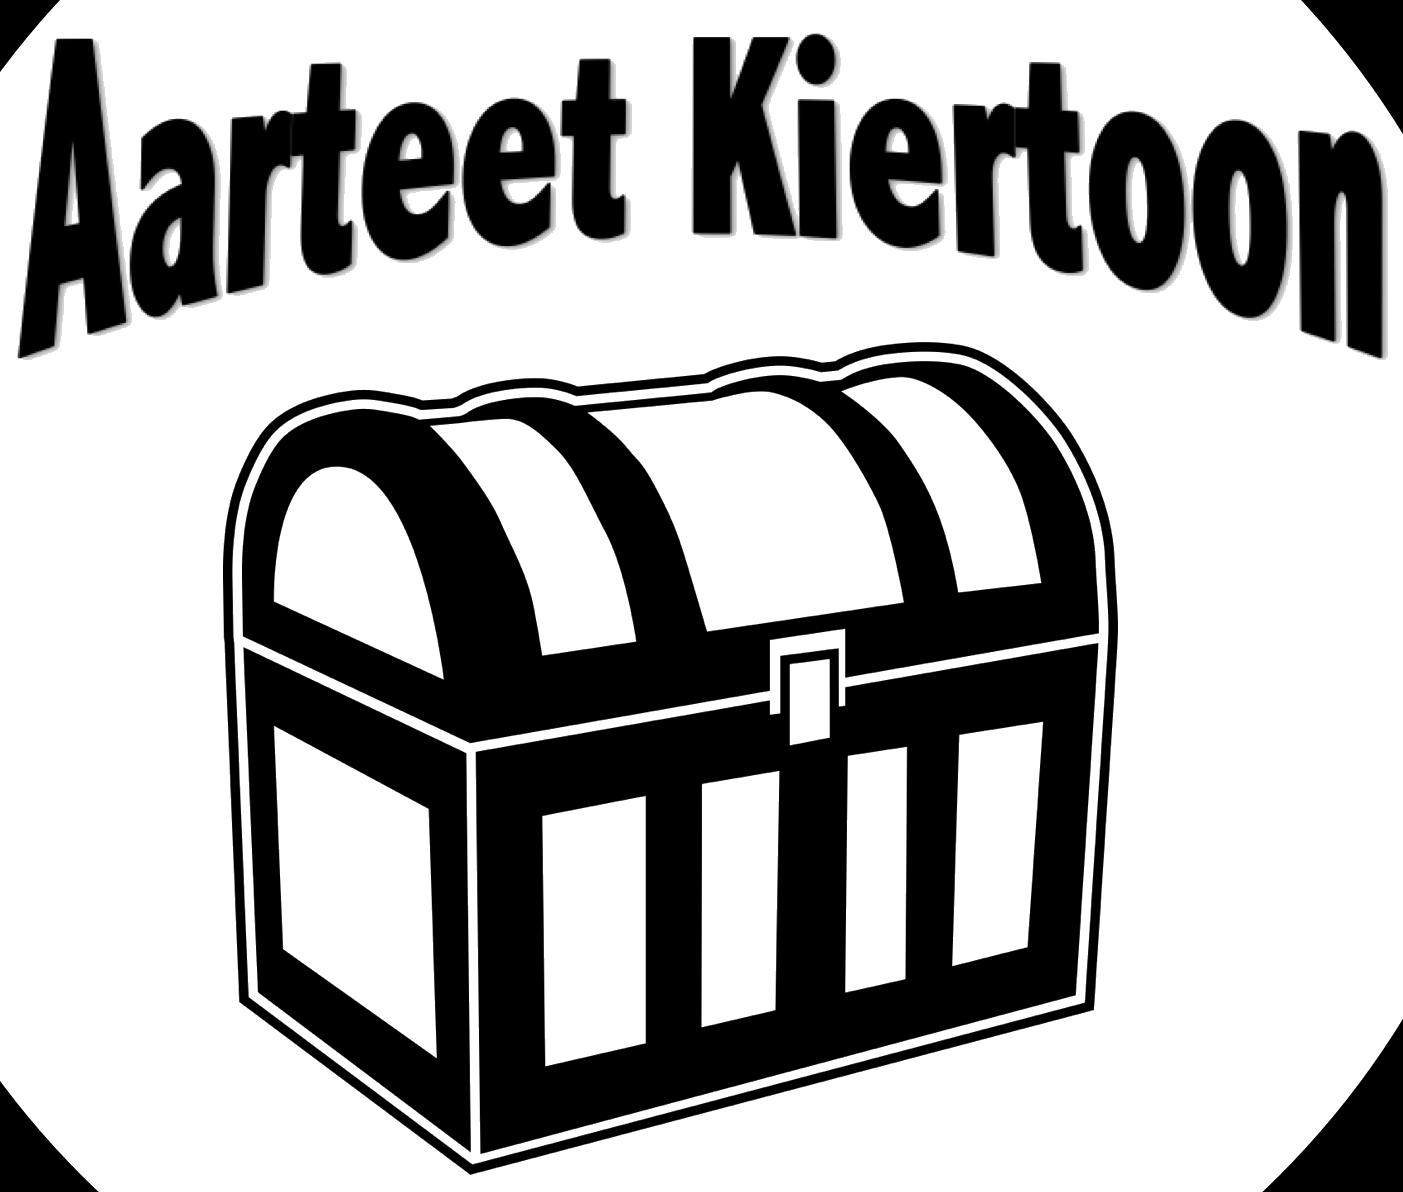 Aarteet Kiertoon